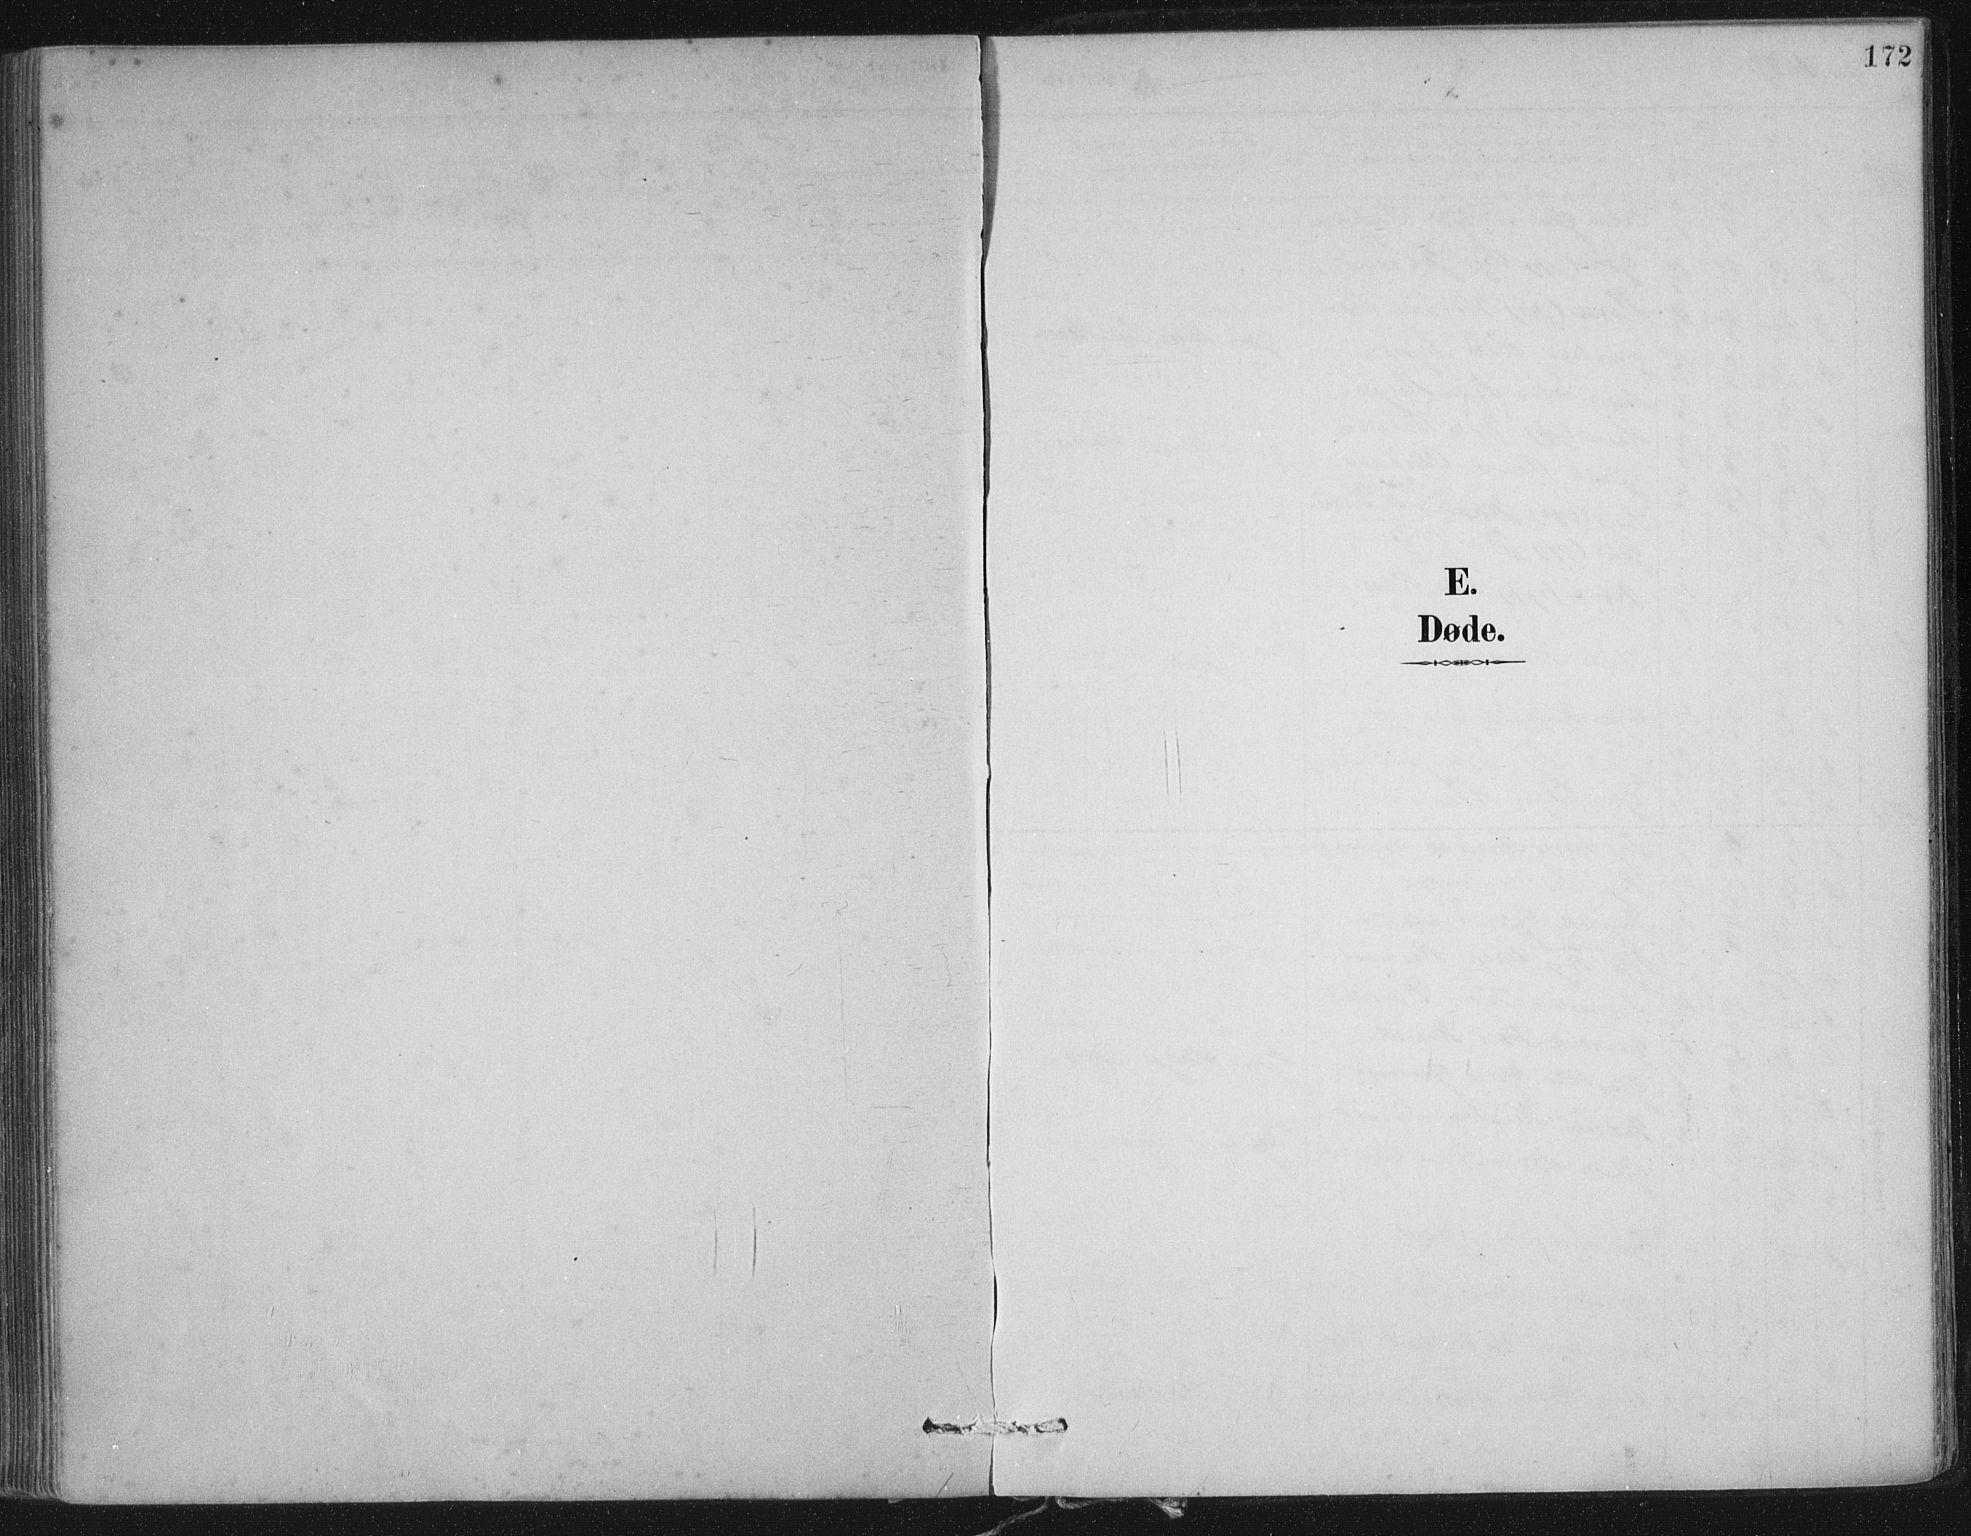 SAST, Nedstrand sokneprestkontor, IV: Ministerialbok nr. A 12, 1887-1915, s. 172